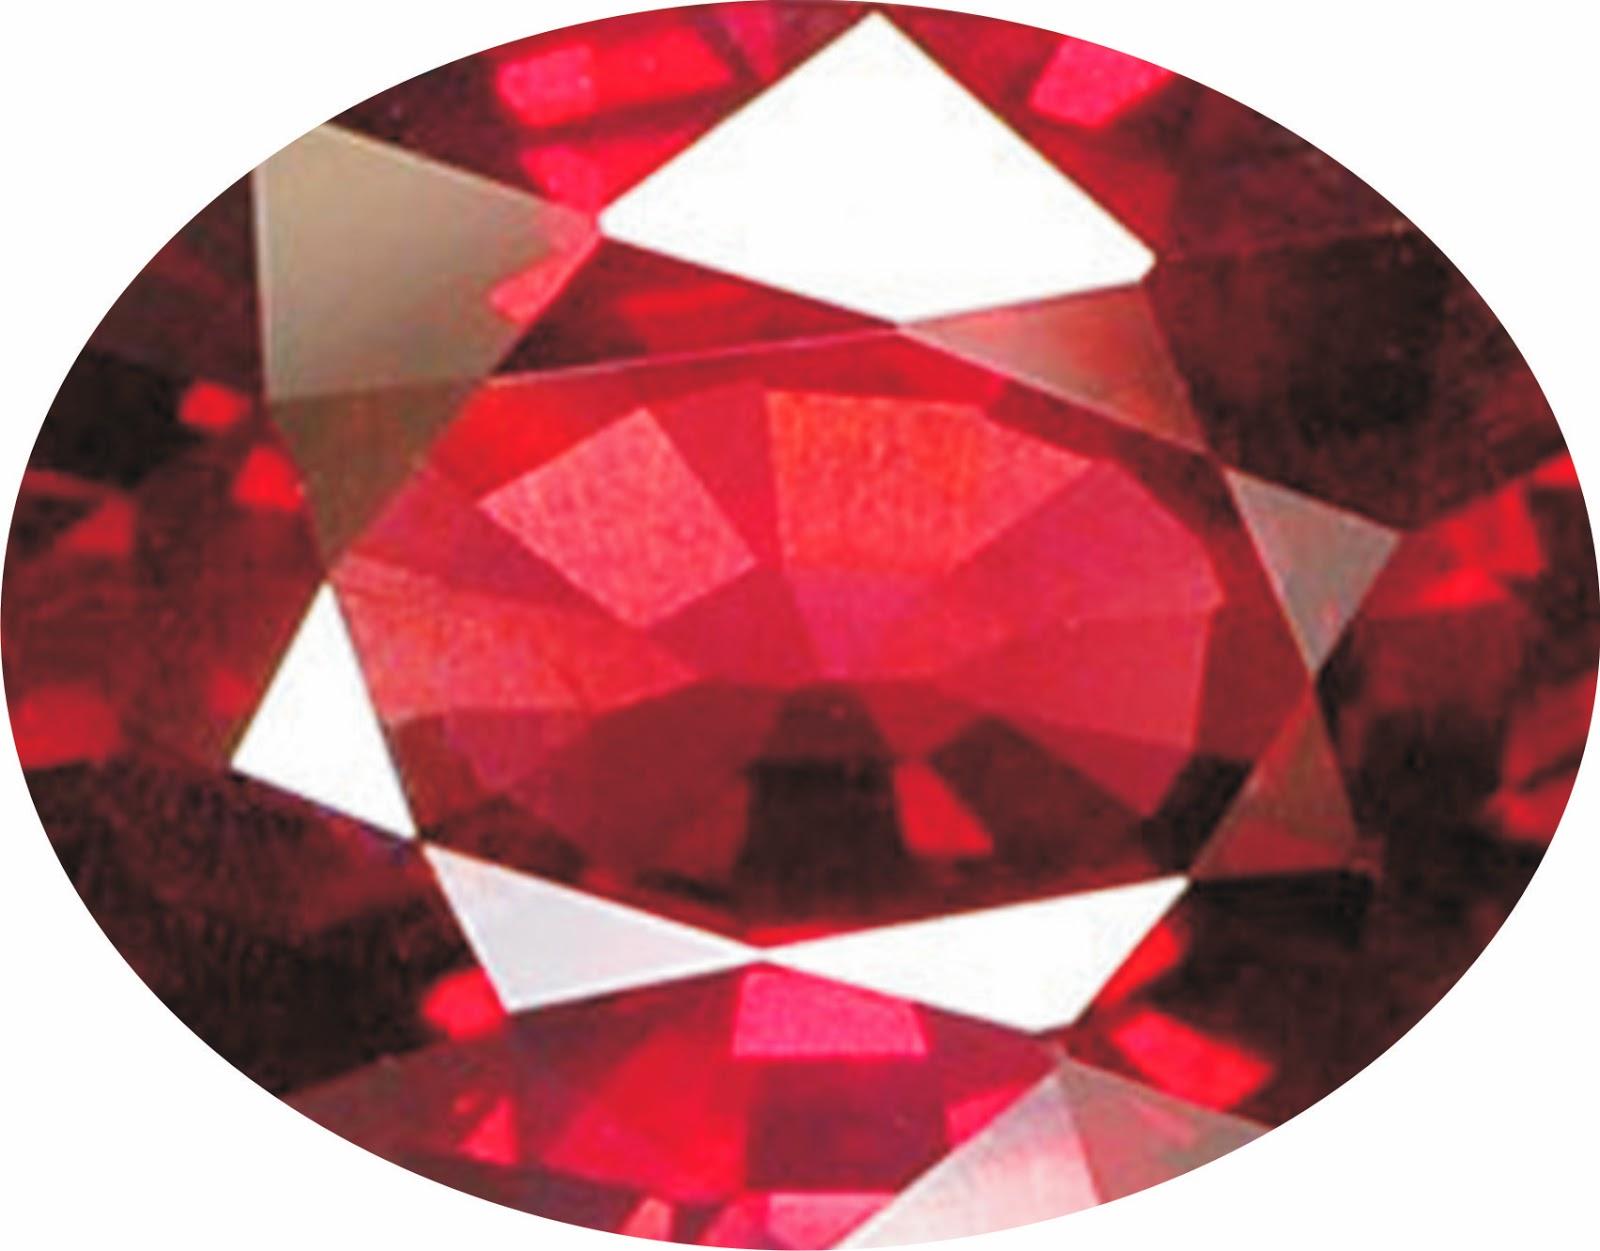 bakthi today ruby gemstone for ring